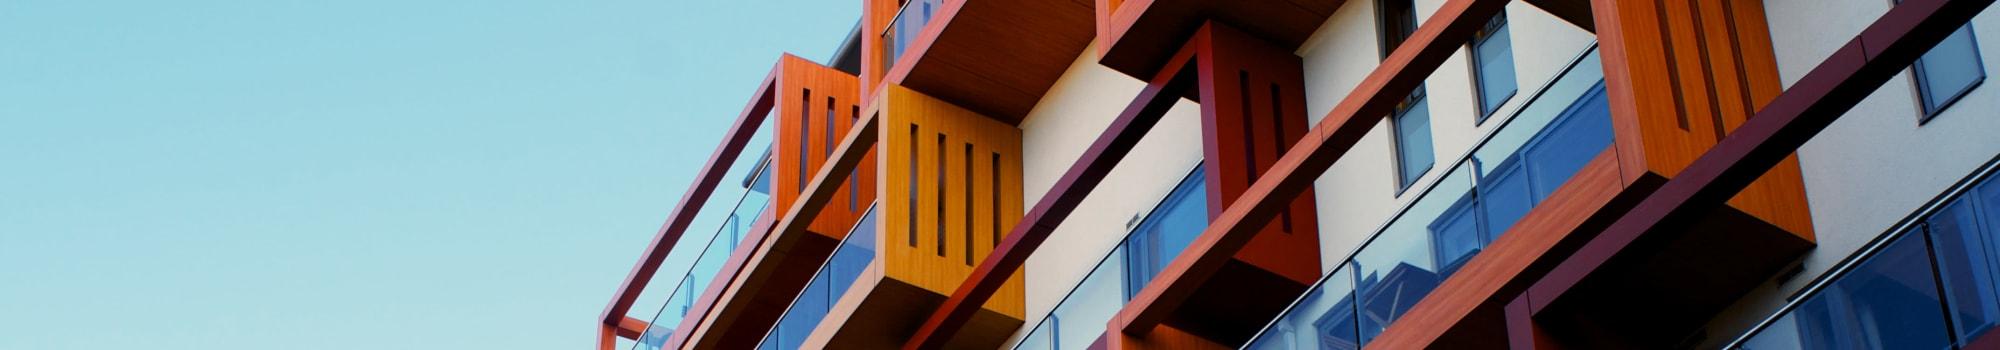 Maintenance Request of Bay Terrace Garden Apartments in Berlin, Maryland